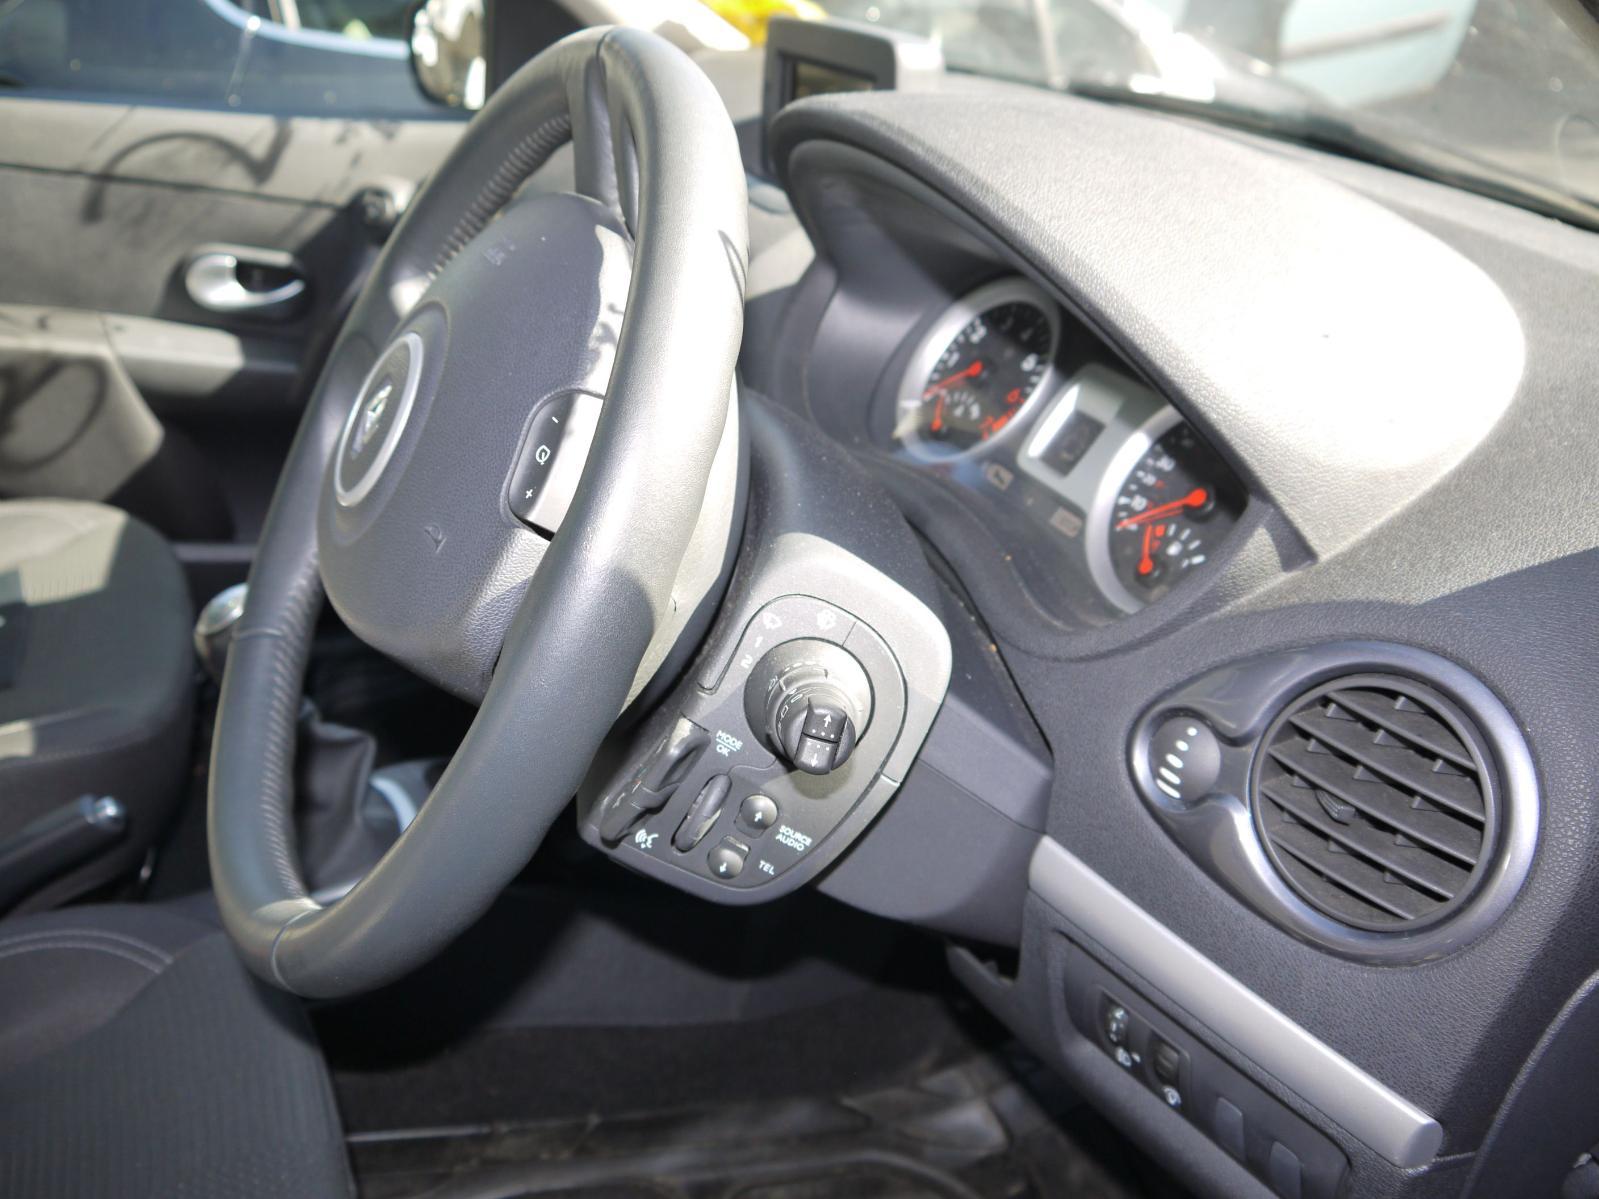 View Auto part Ignition W/Key RENAULT CLIO 2010